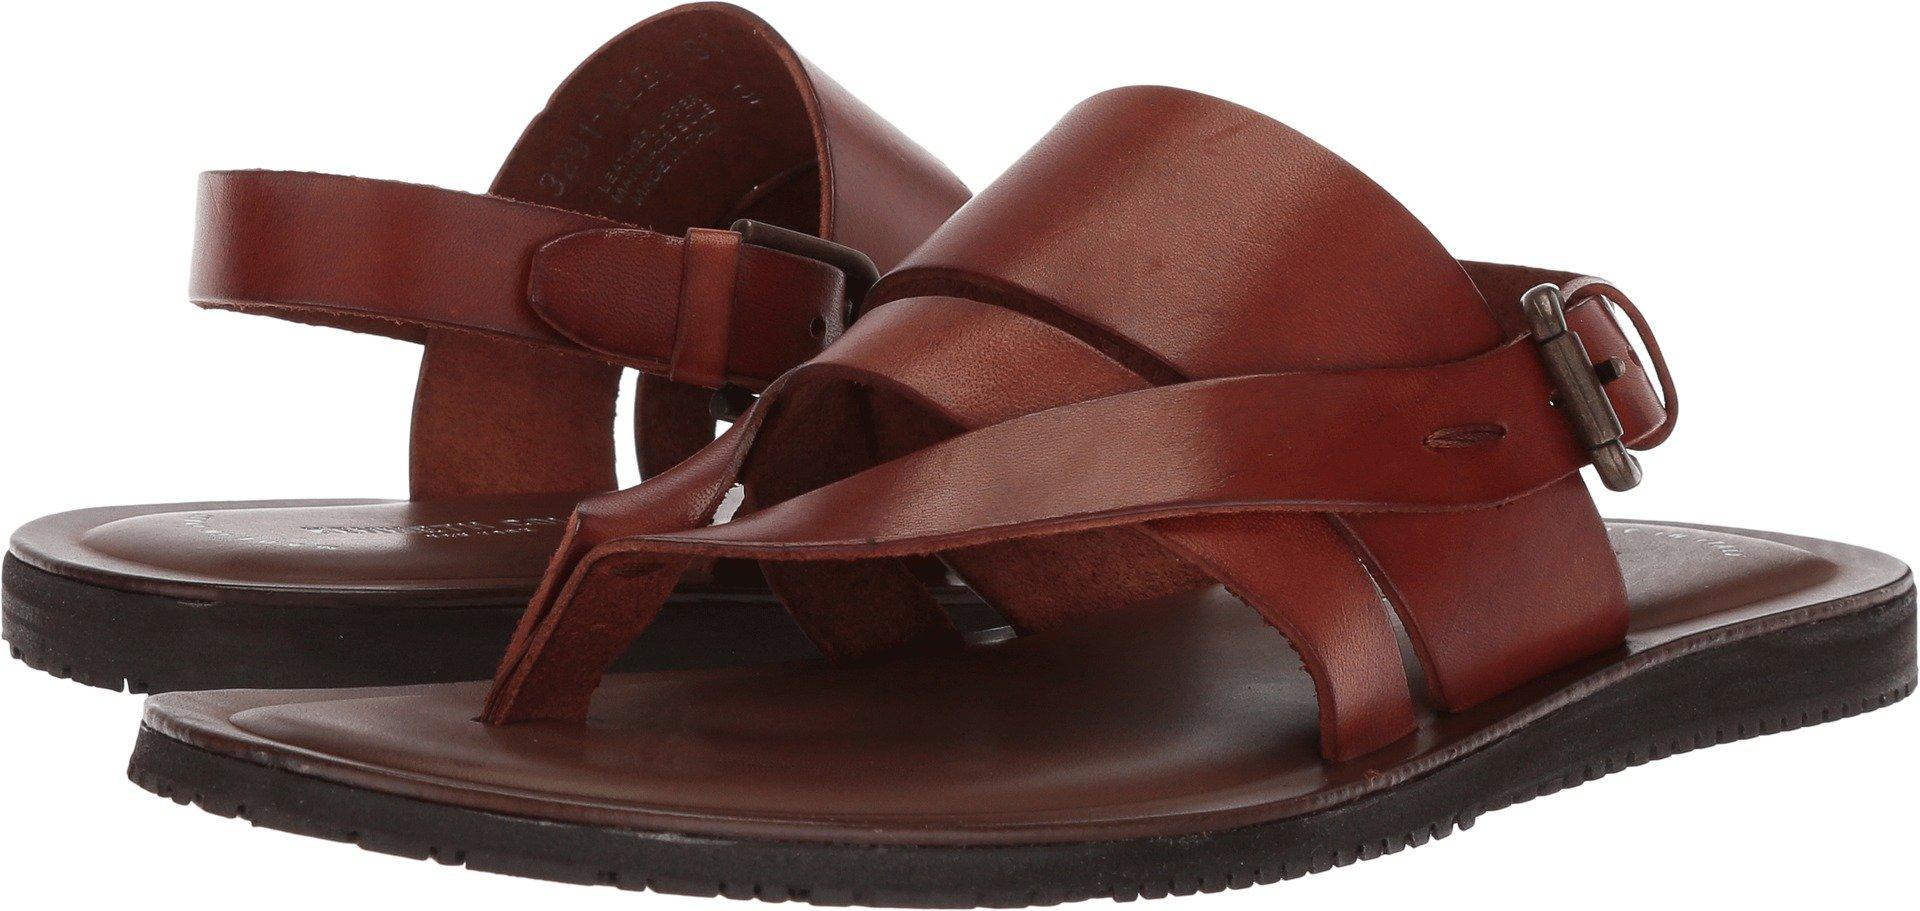 Kenneth Cole New York Men's Reel-IST Flat Sandal, Cognac, 10 M US